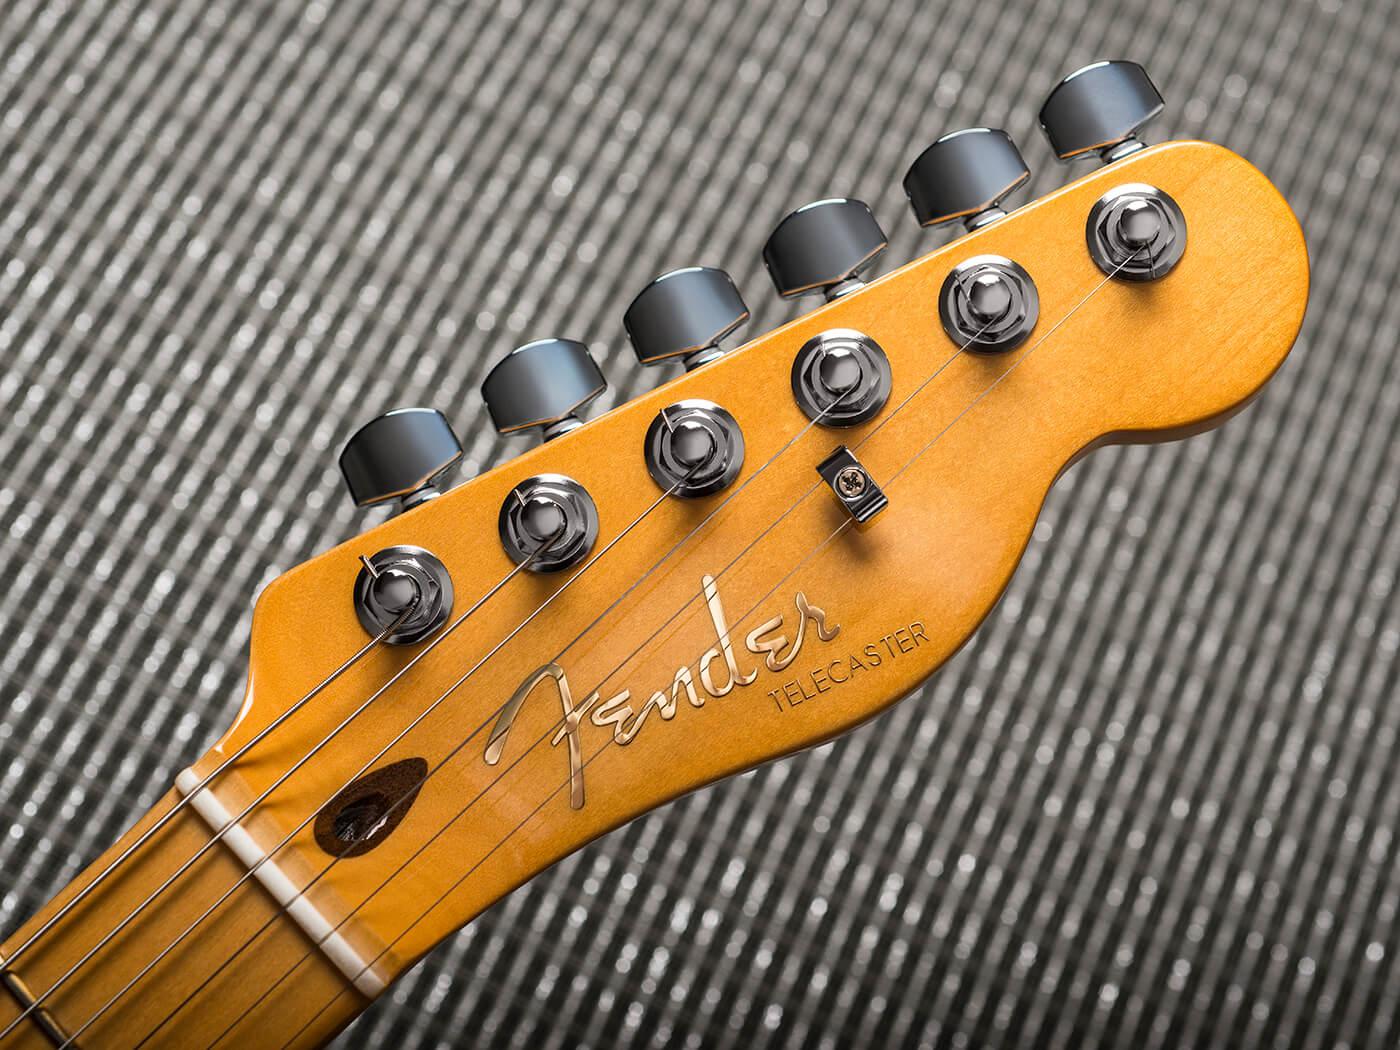 Fender American Ultra Telecaster (Headstock)